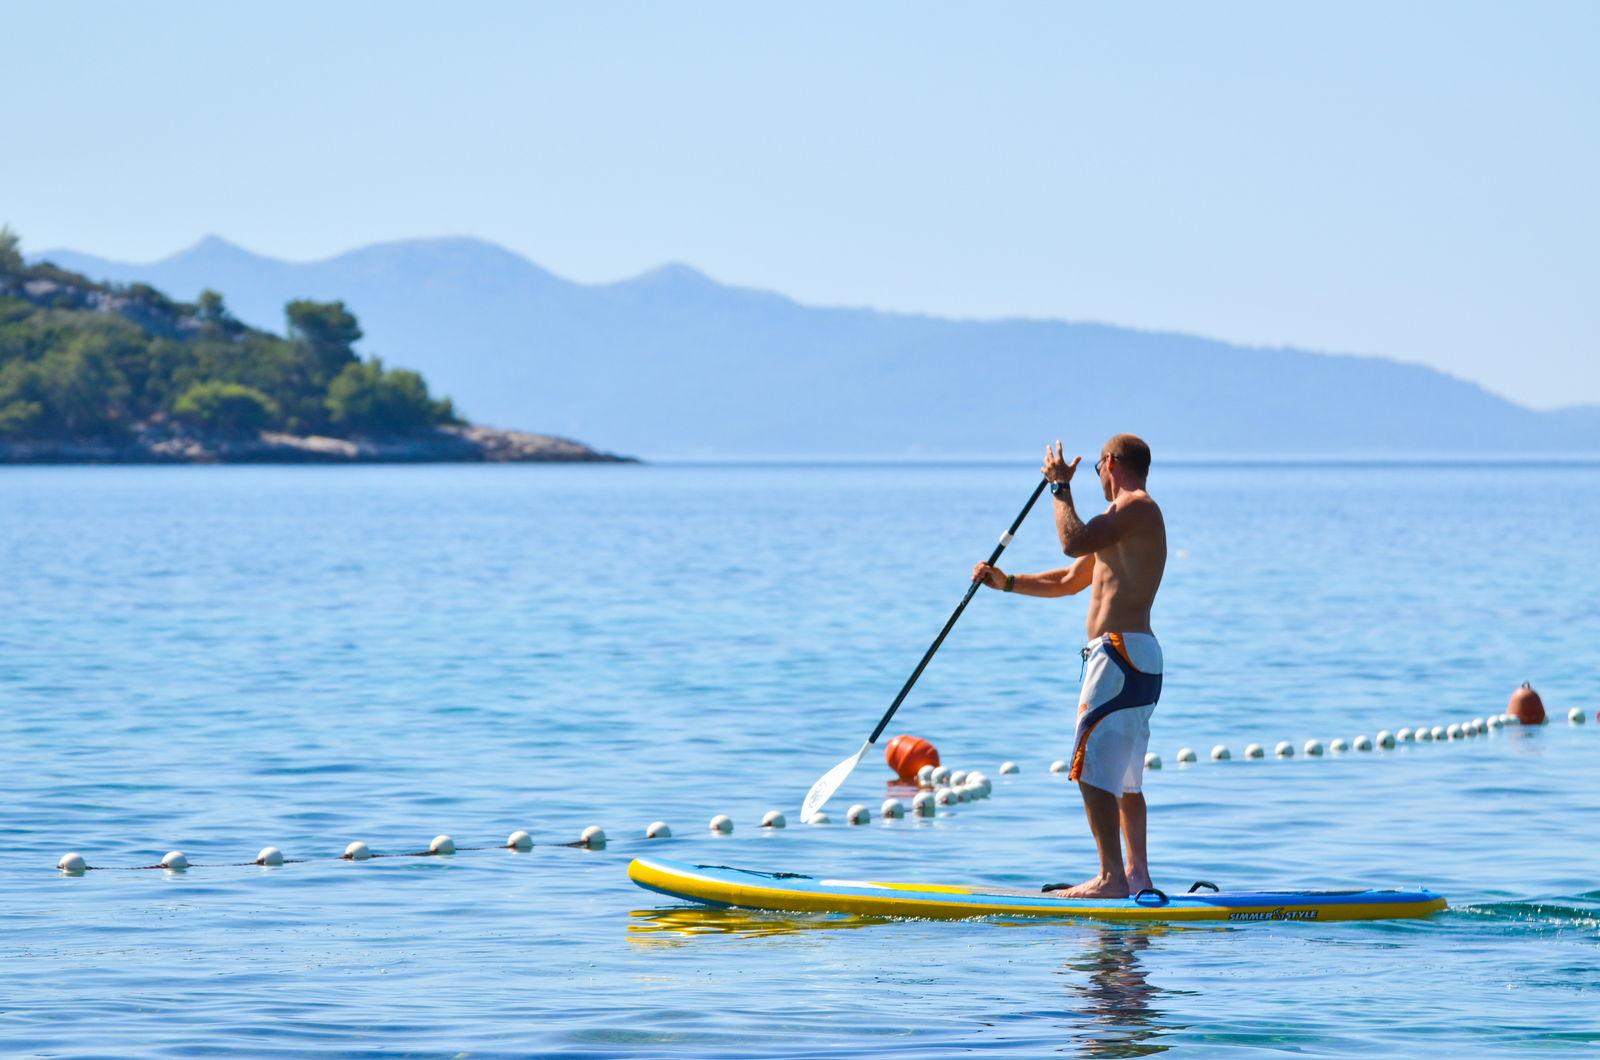 korcula windsurfing lessons extreme 08 - Lokacija - Prižba, Korčula